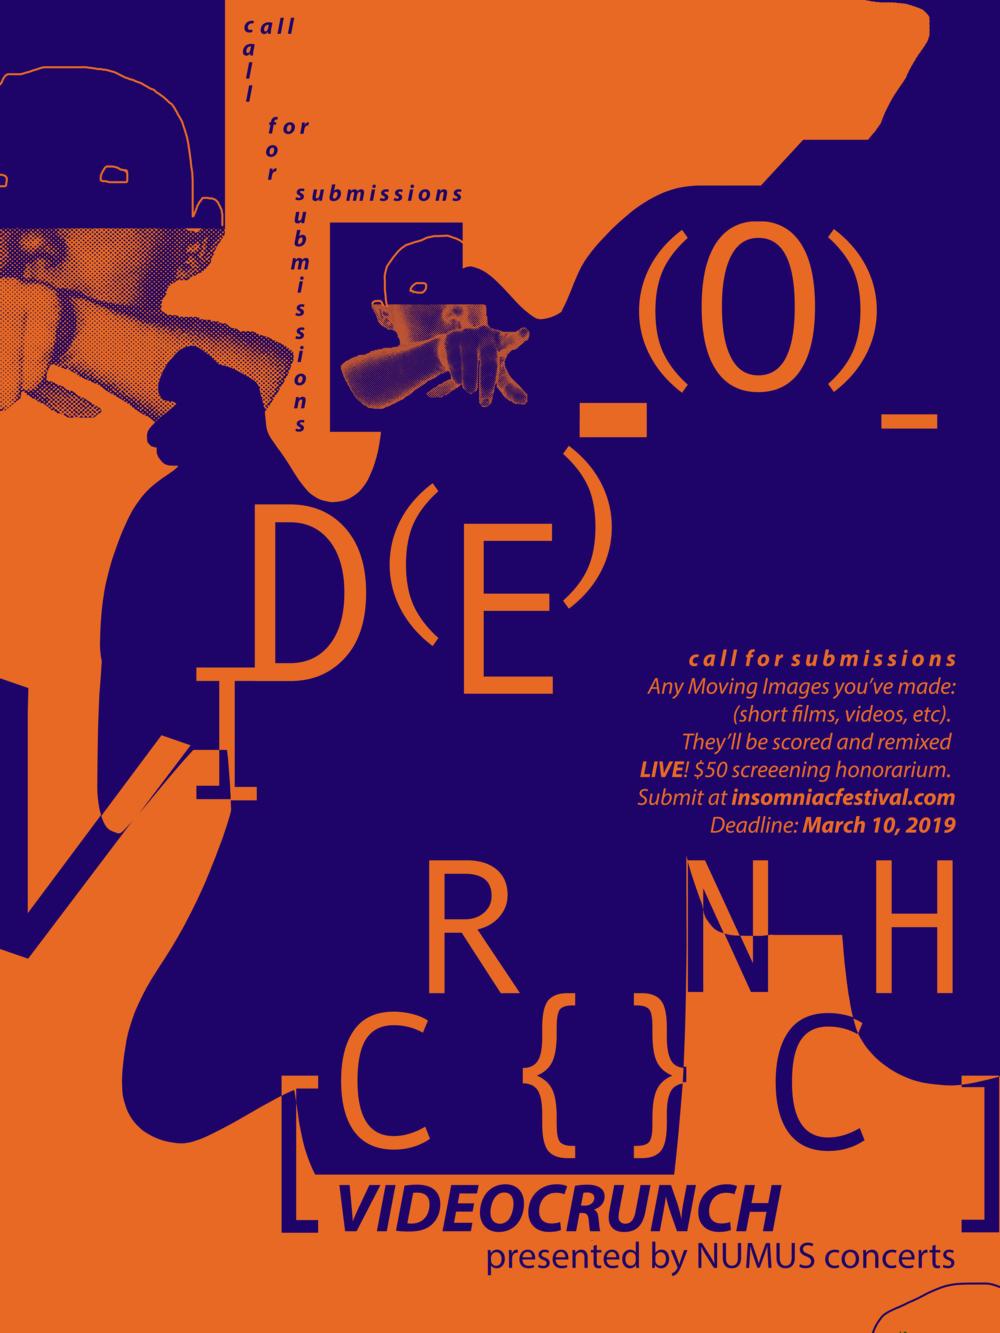 Poster designed by Erika Verhagen